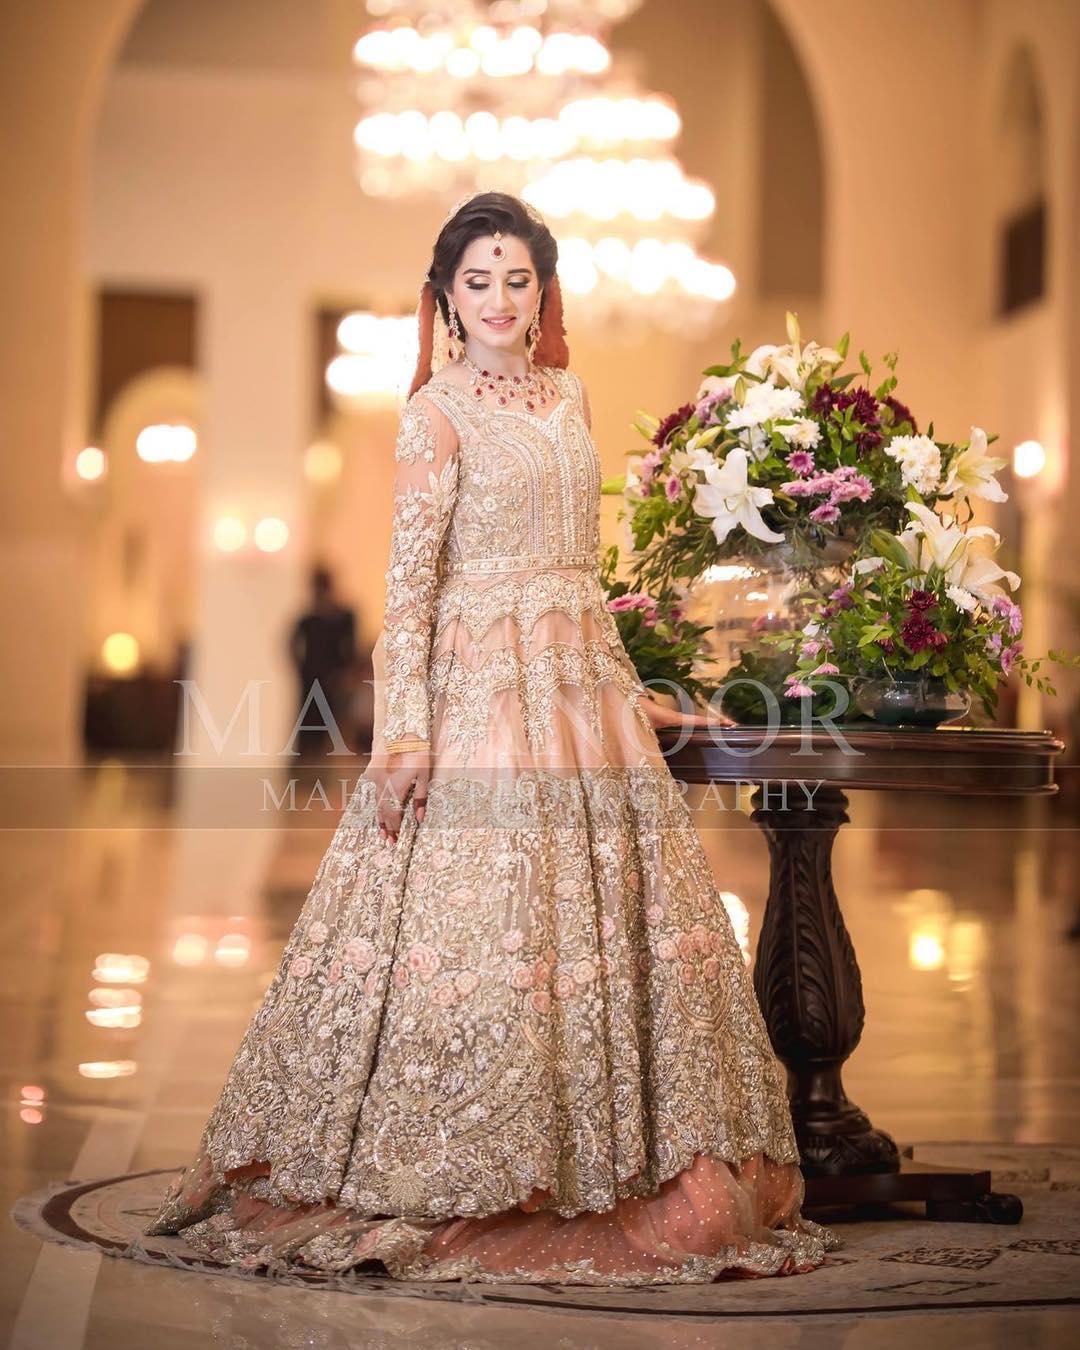 New Pakistani Bridal Dress In Light Colours 2018-19